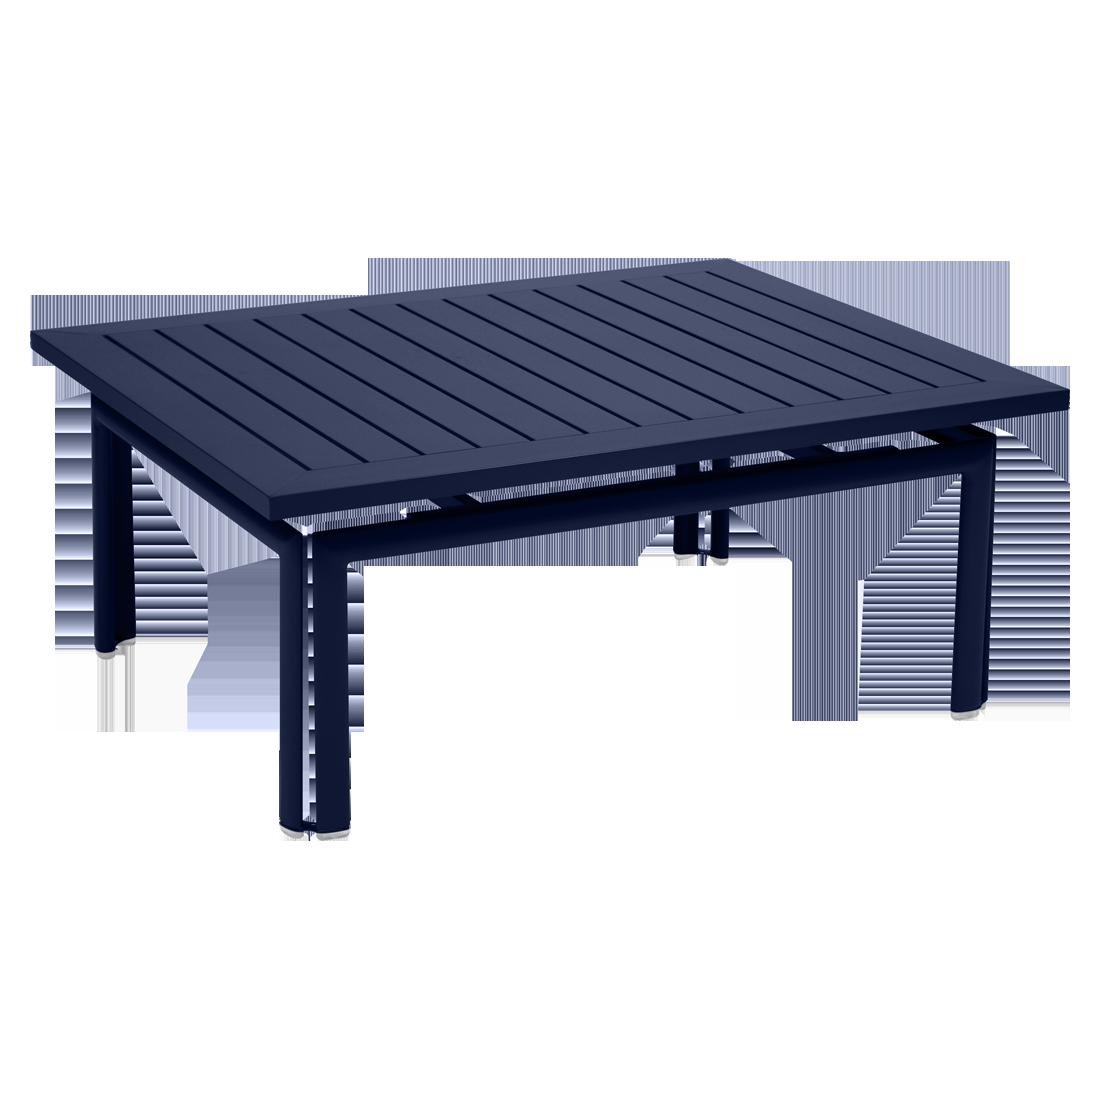 table basse metal, table basse de jardin, table basse bleu